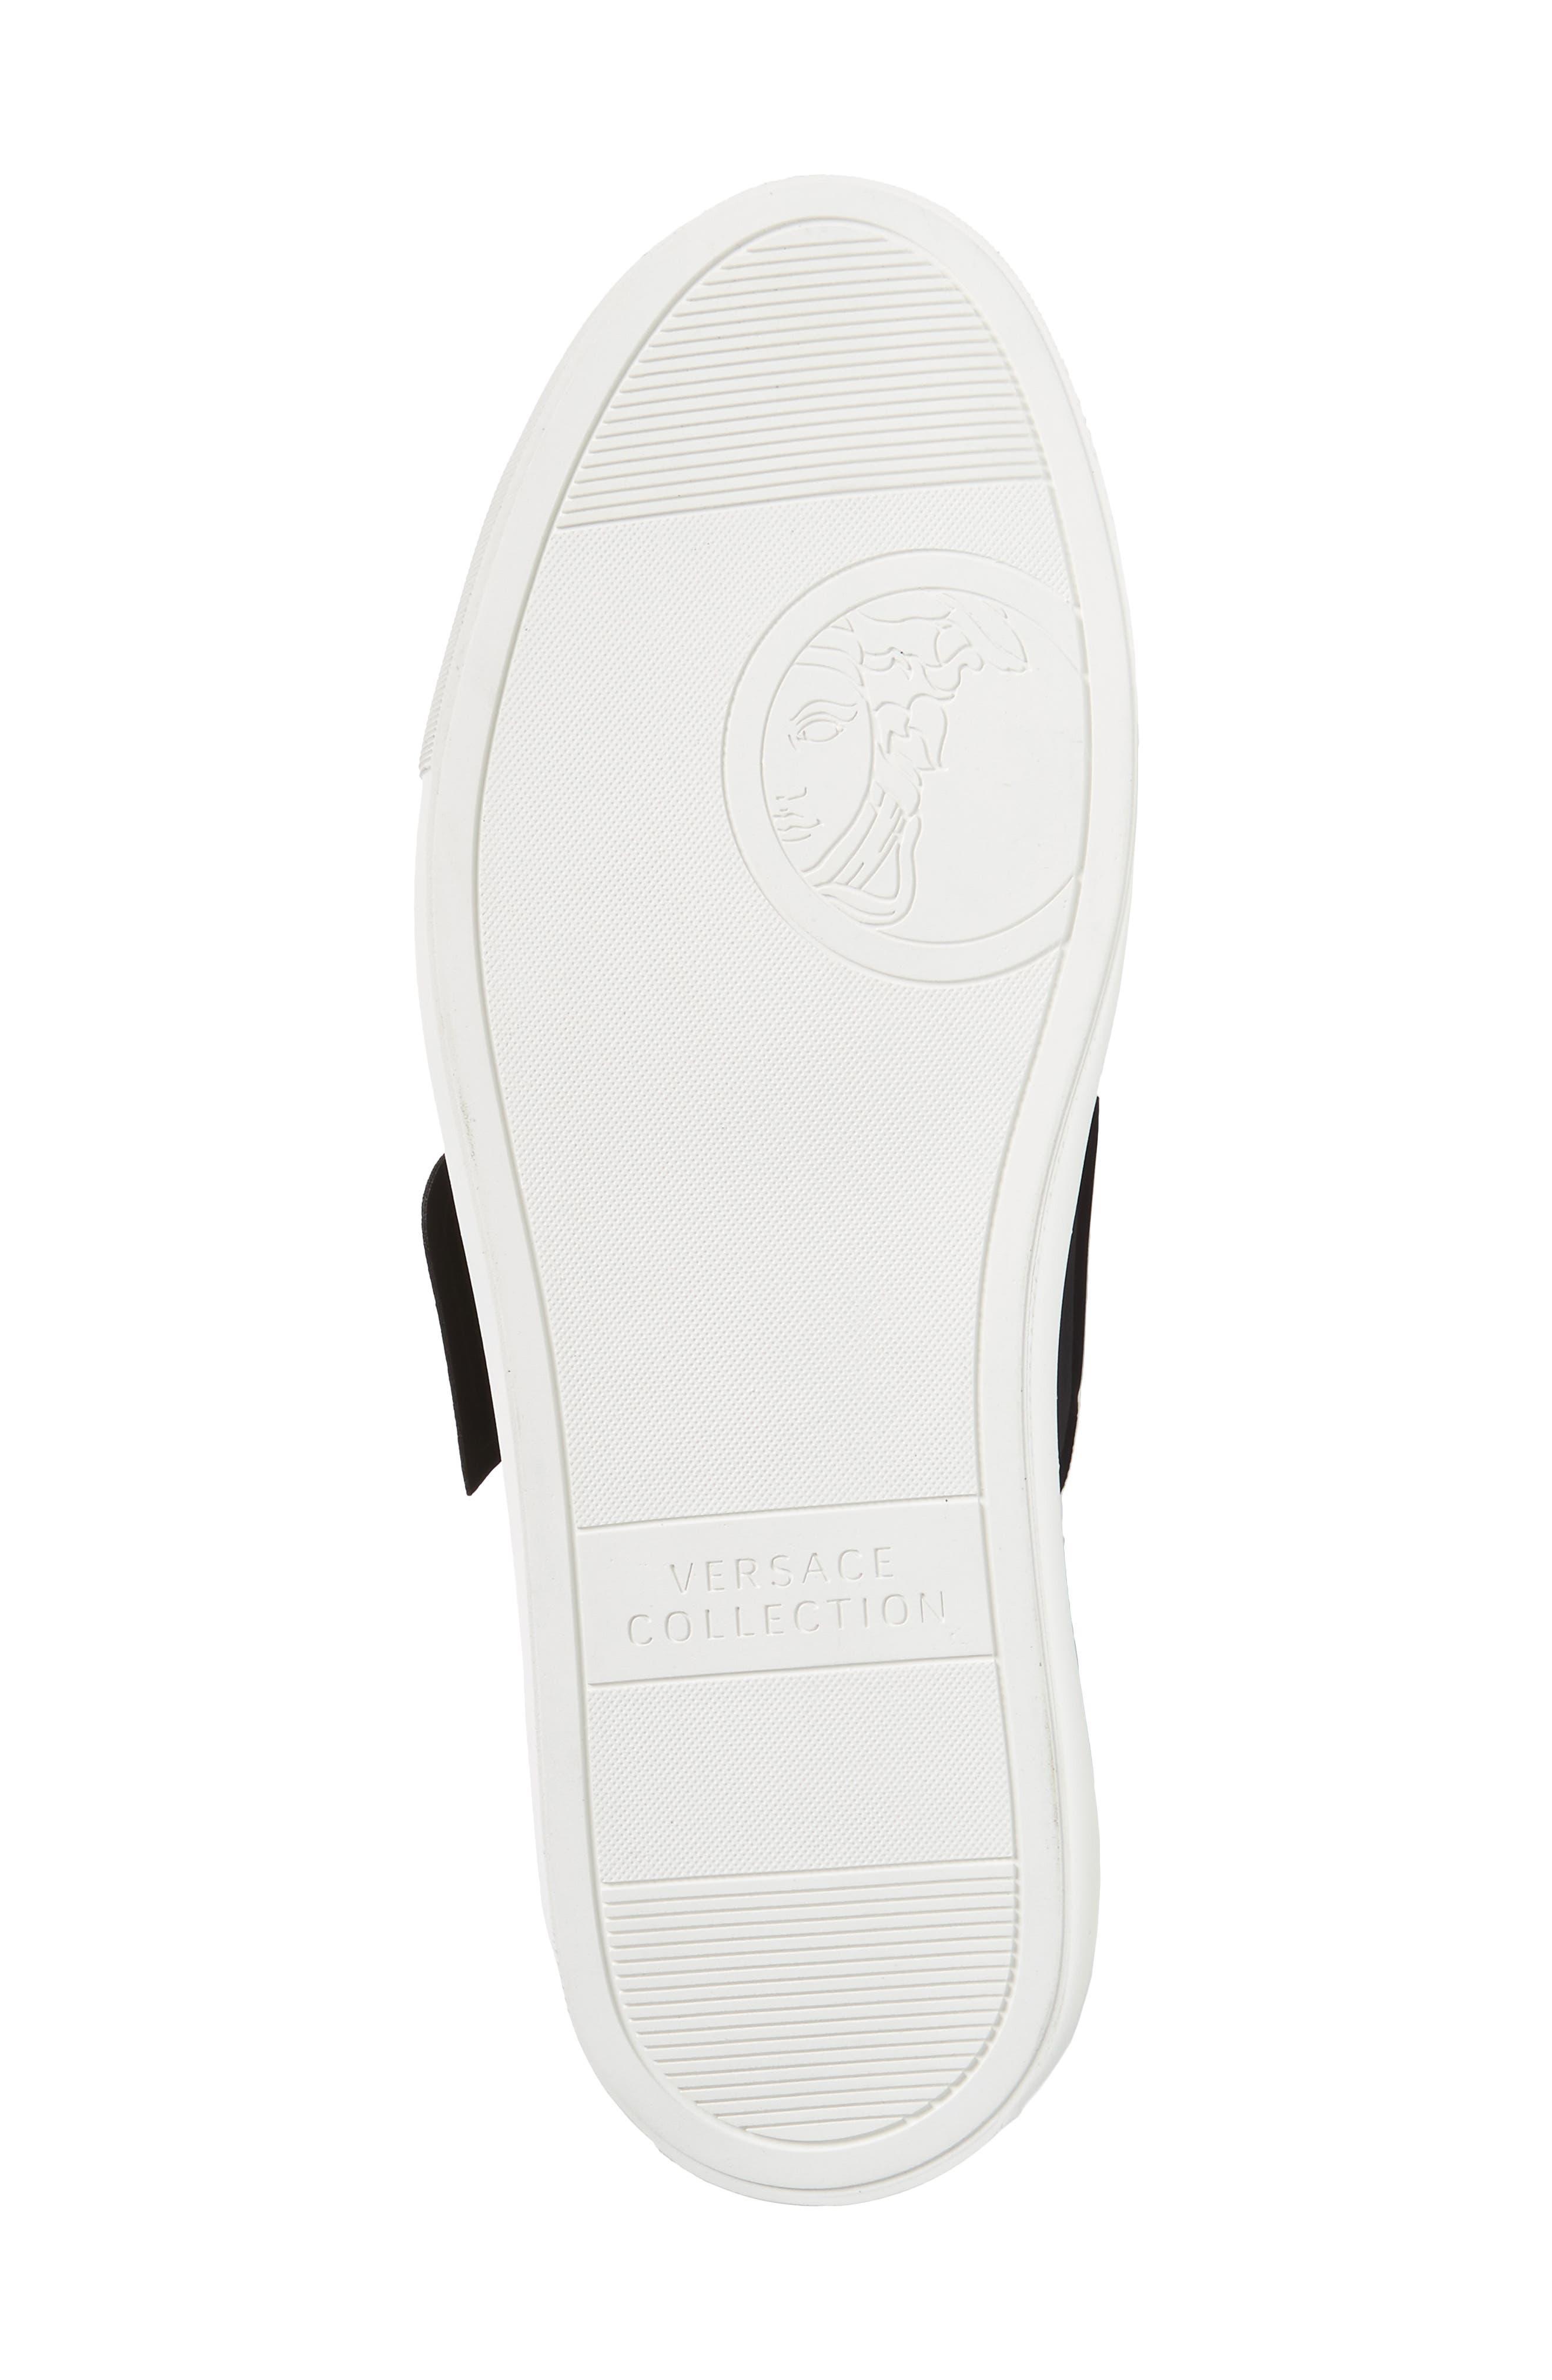 Strap Sneaker,                             Alternate thumbnail 6, color,                             Bianco/ Nero Leather